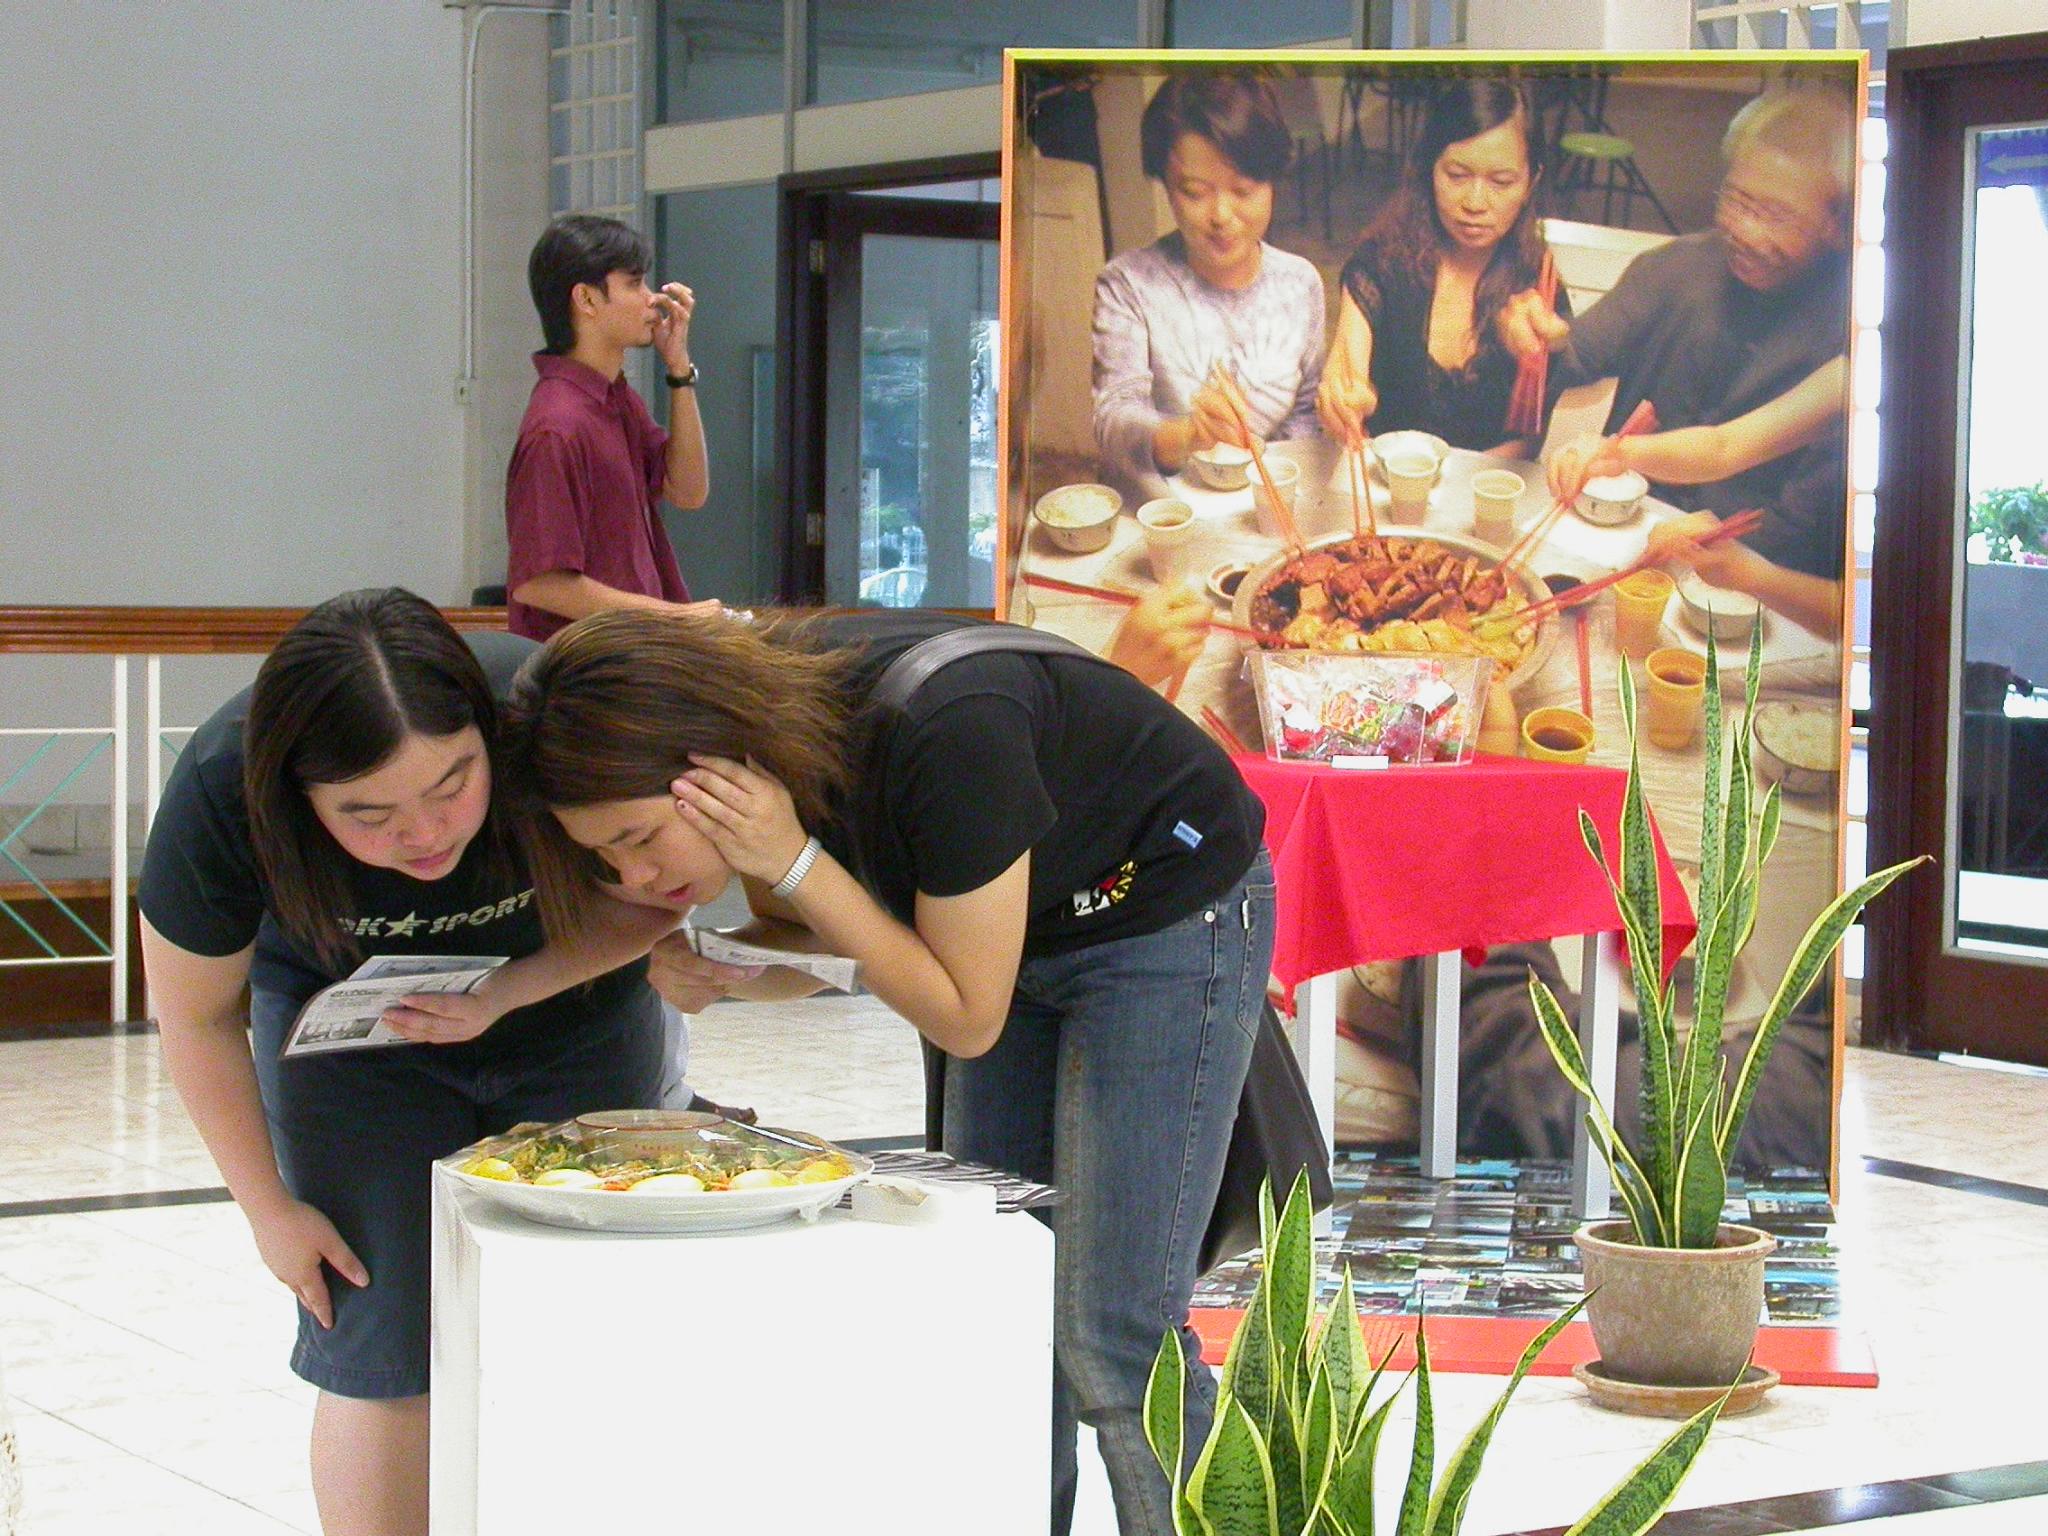 whw_MY_Penang_Tasting Asia_Jun 2003 (2213)_HK_Girls.jpg